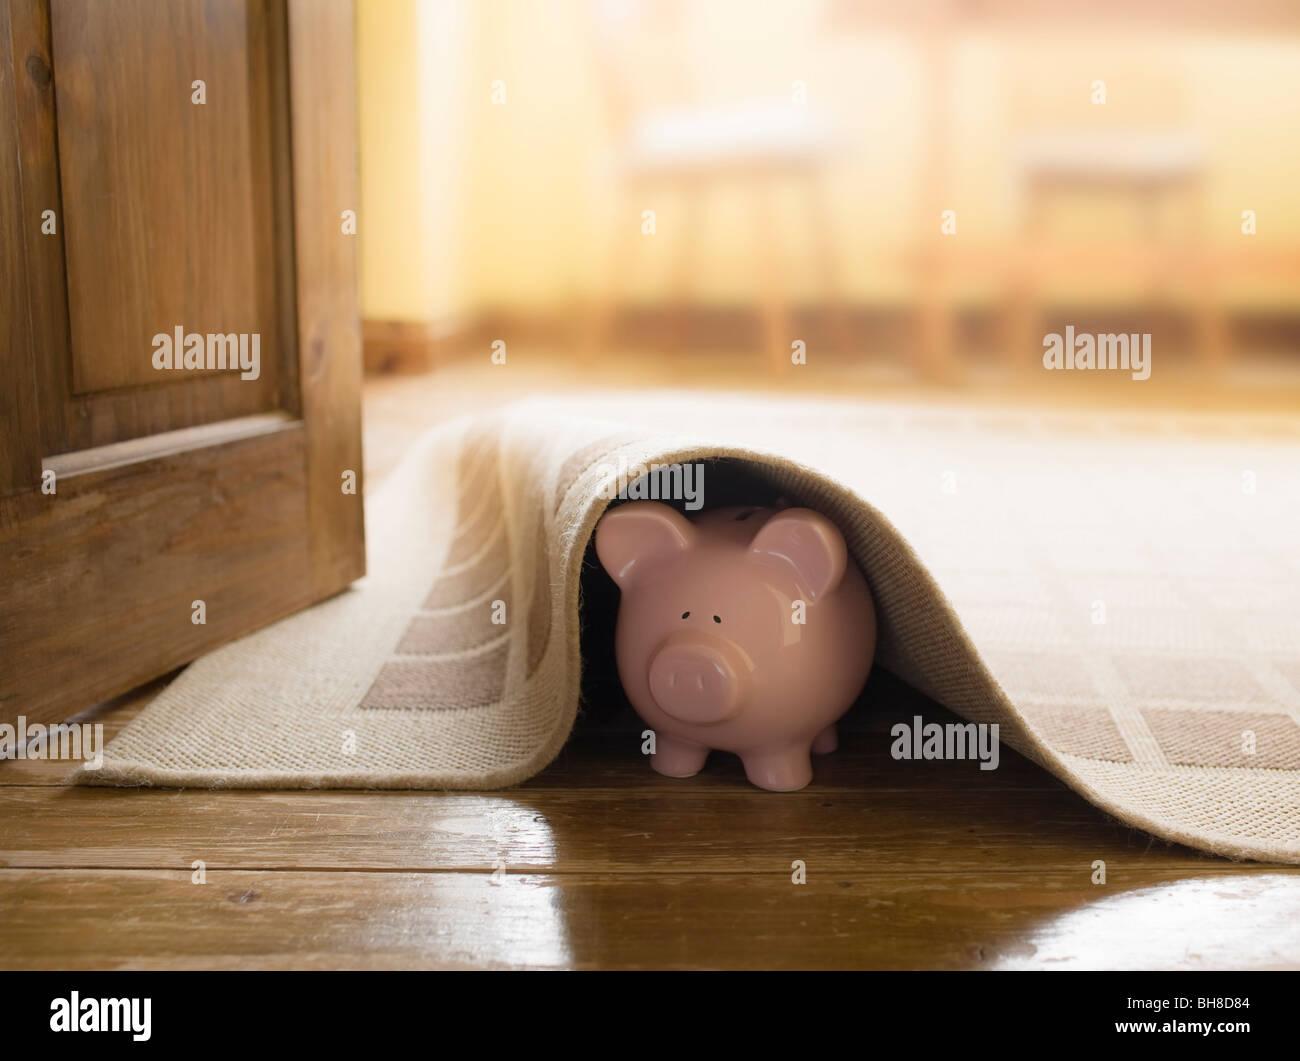 Piggy bank under rug - Stock Image